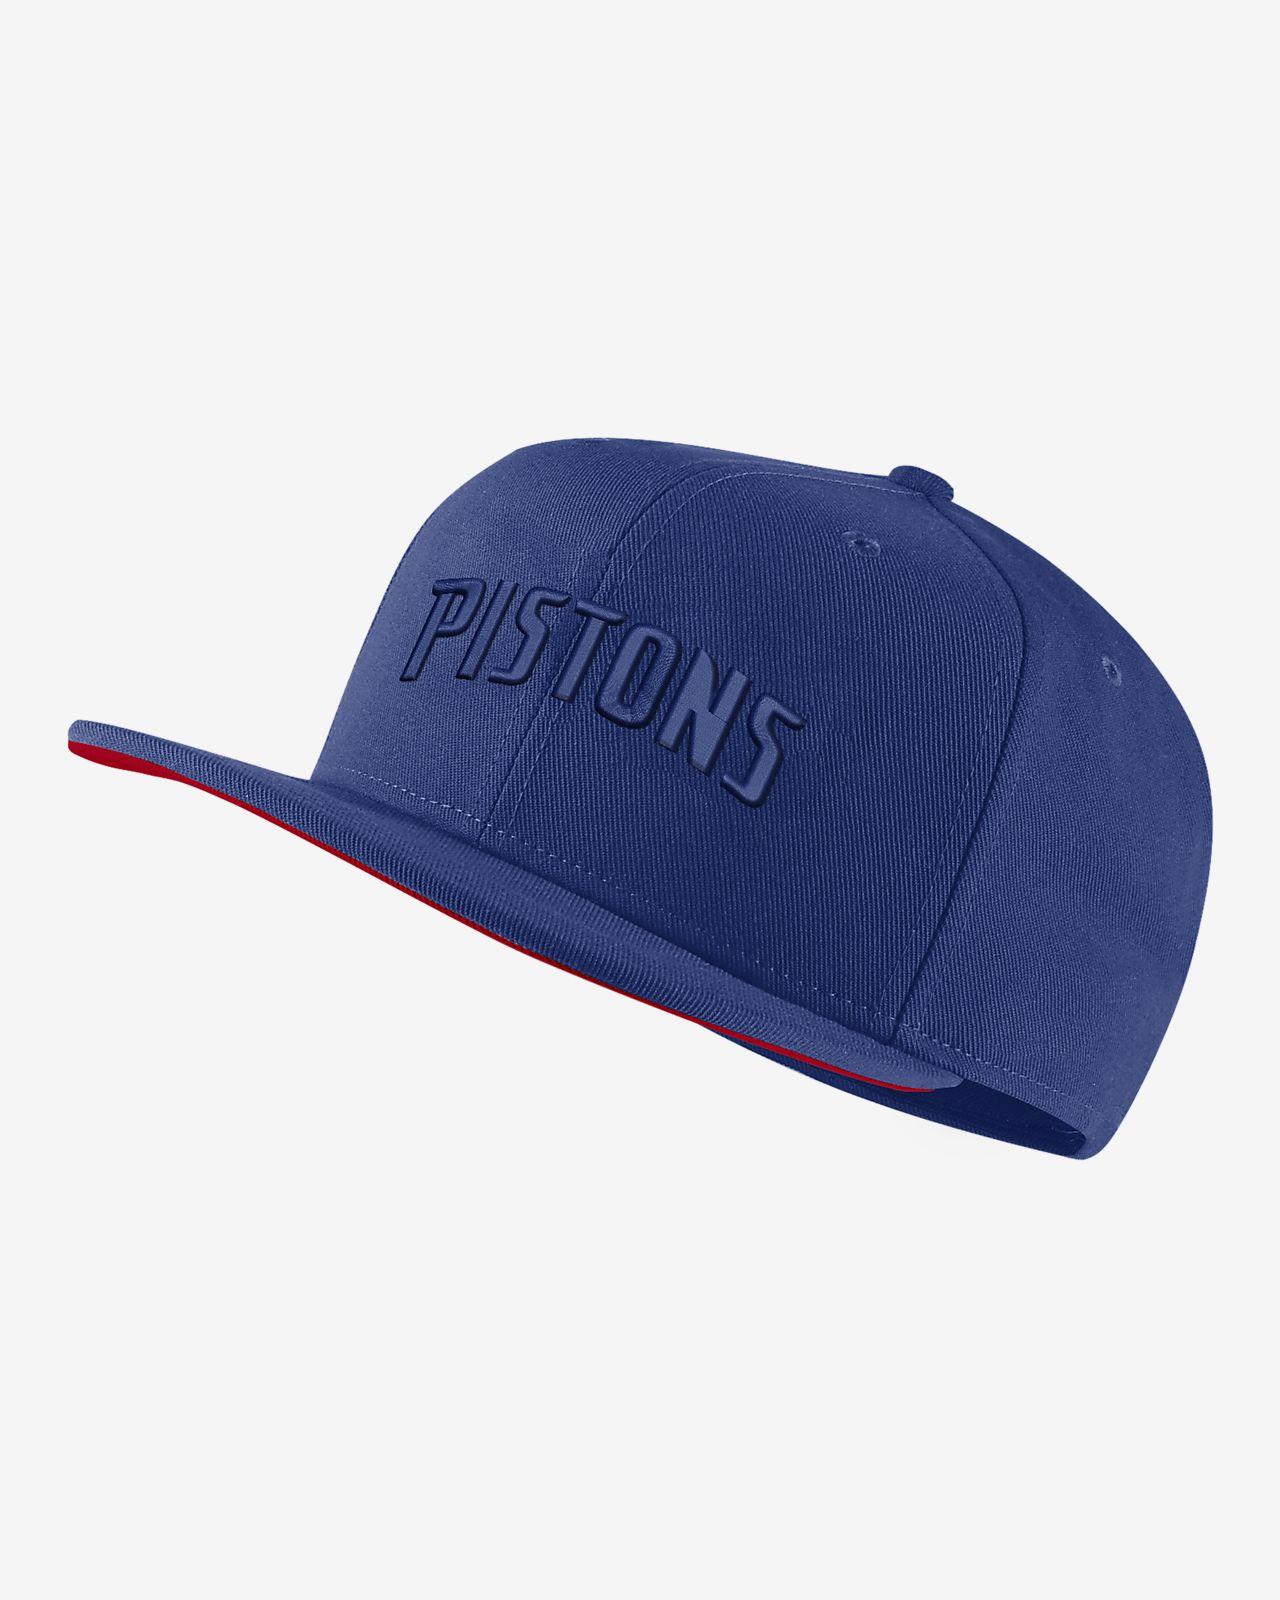 e9155a8efaea6 Detroit Pistons Nike AeroBill NBA Hat. Nike.com AU